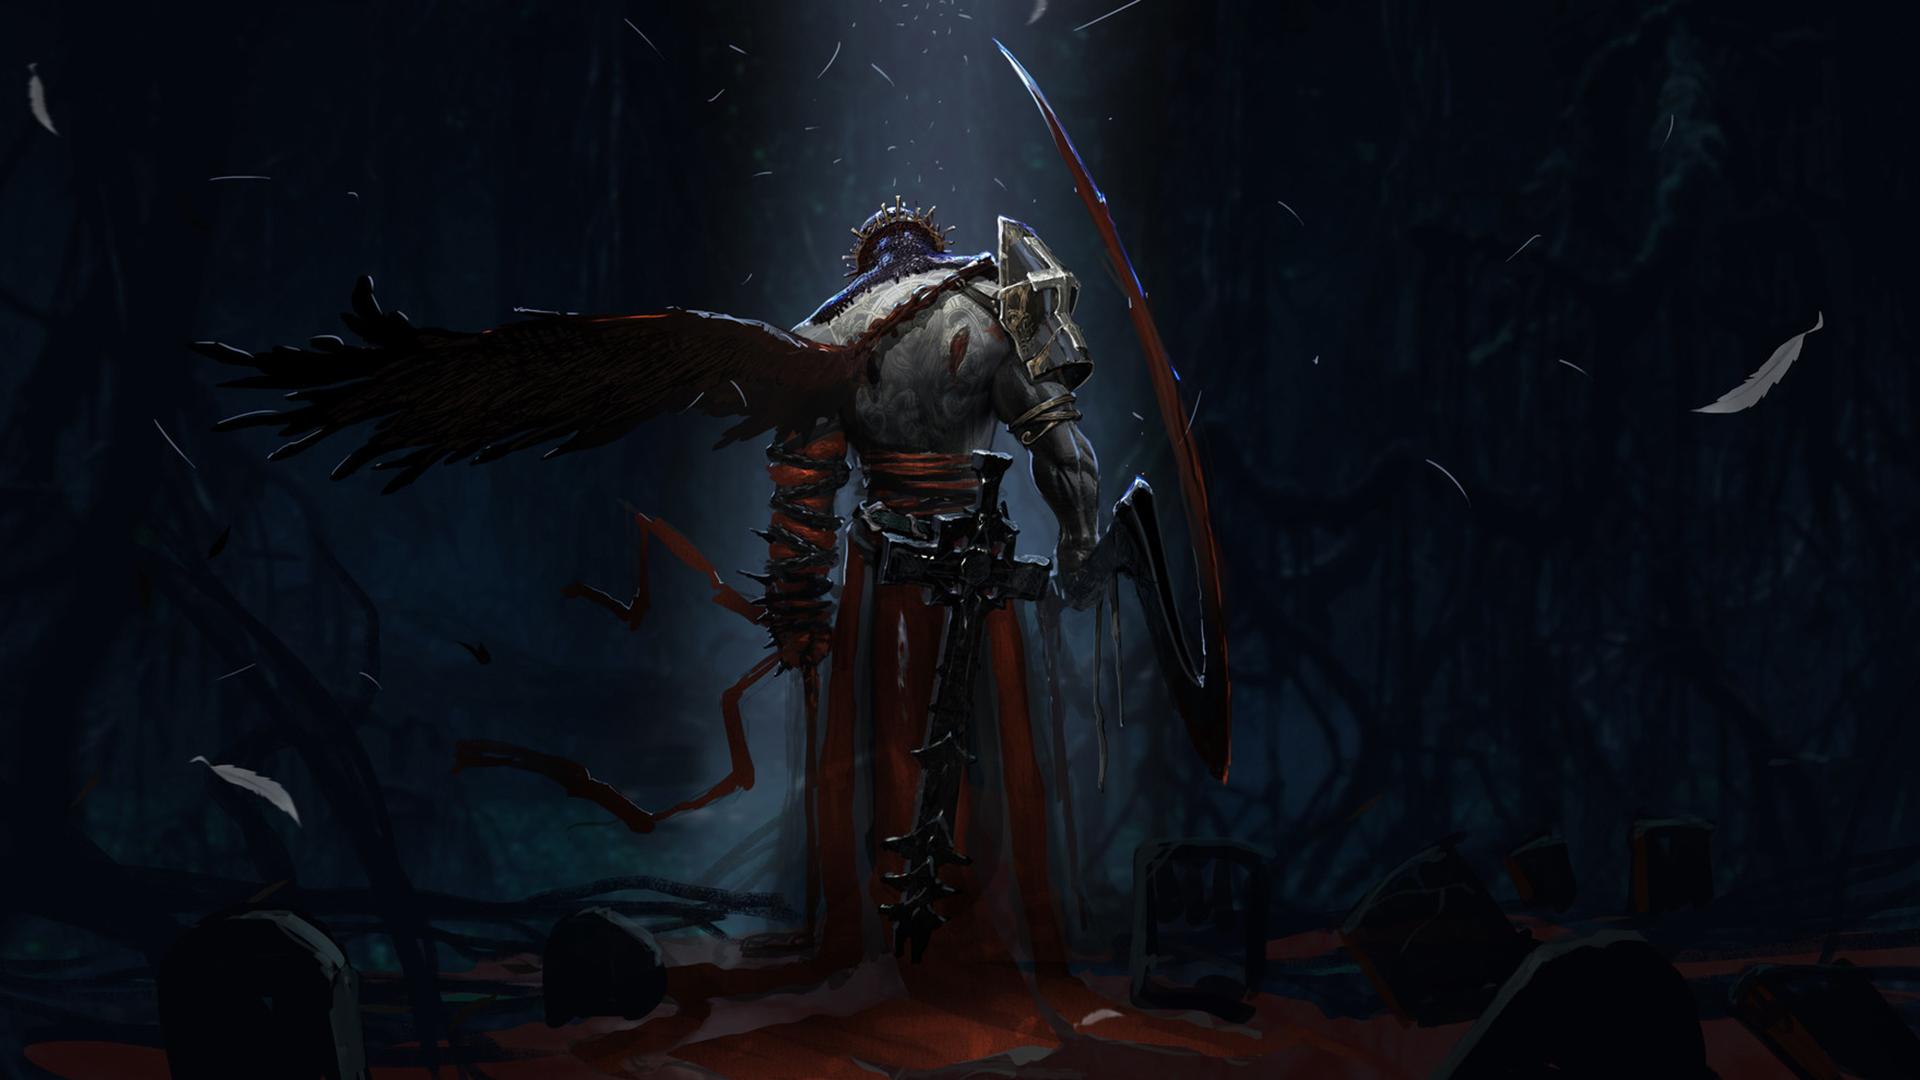 General 1920x1080 Dante cemetery crown cross tombstones night armor dark red blood white Dante's Inferno video games